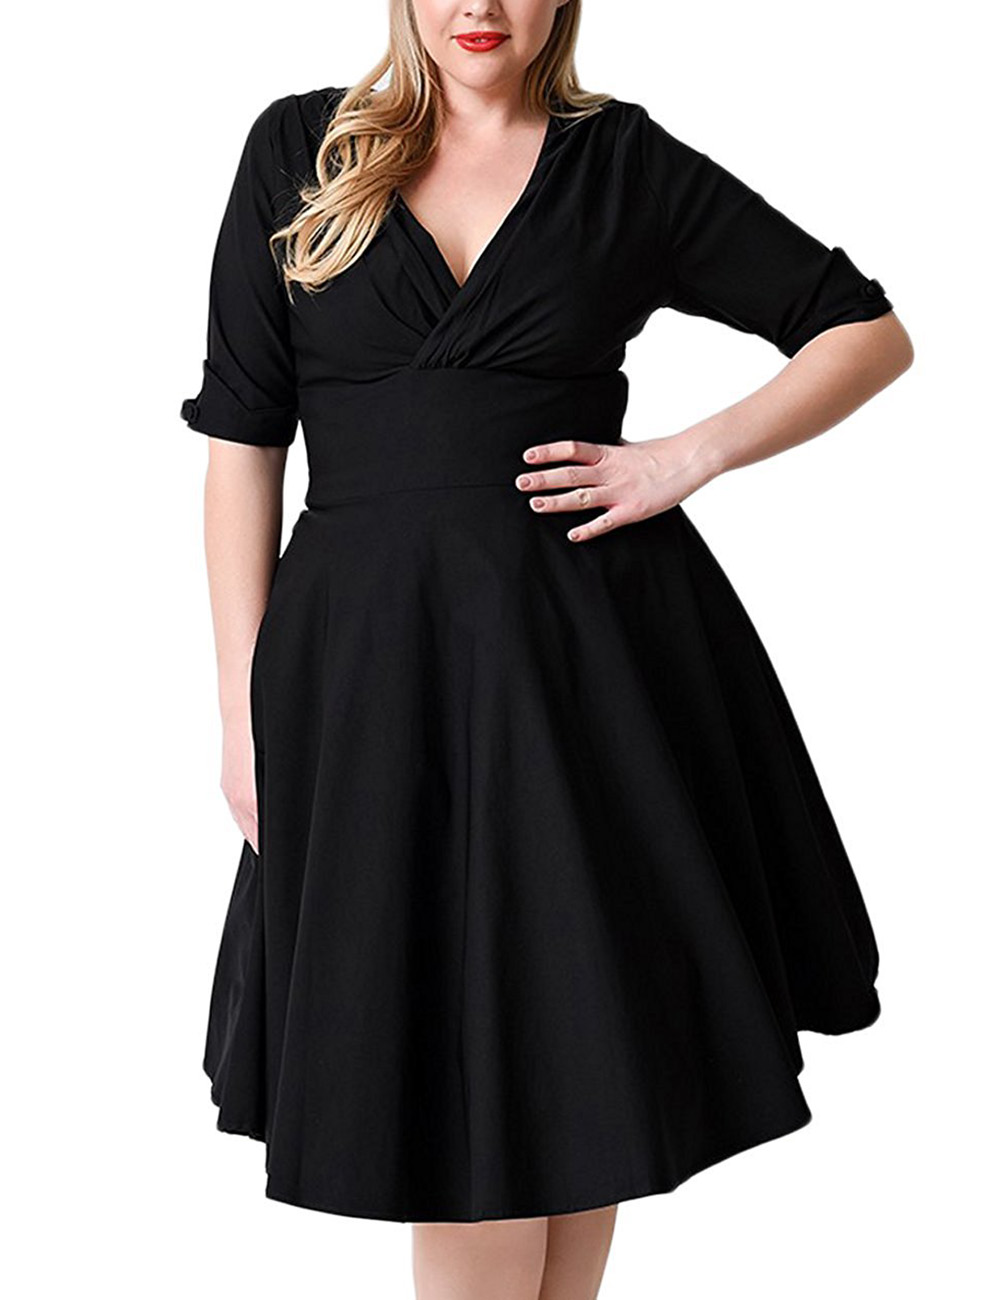 AMZ PLUS Large Size Ruffles V-neck Empire Waist A-line Swing Dress